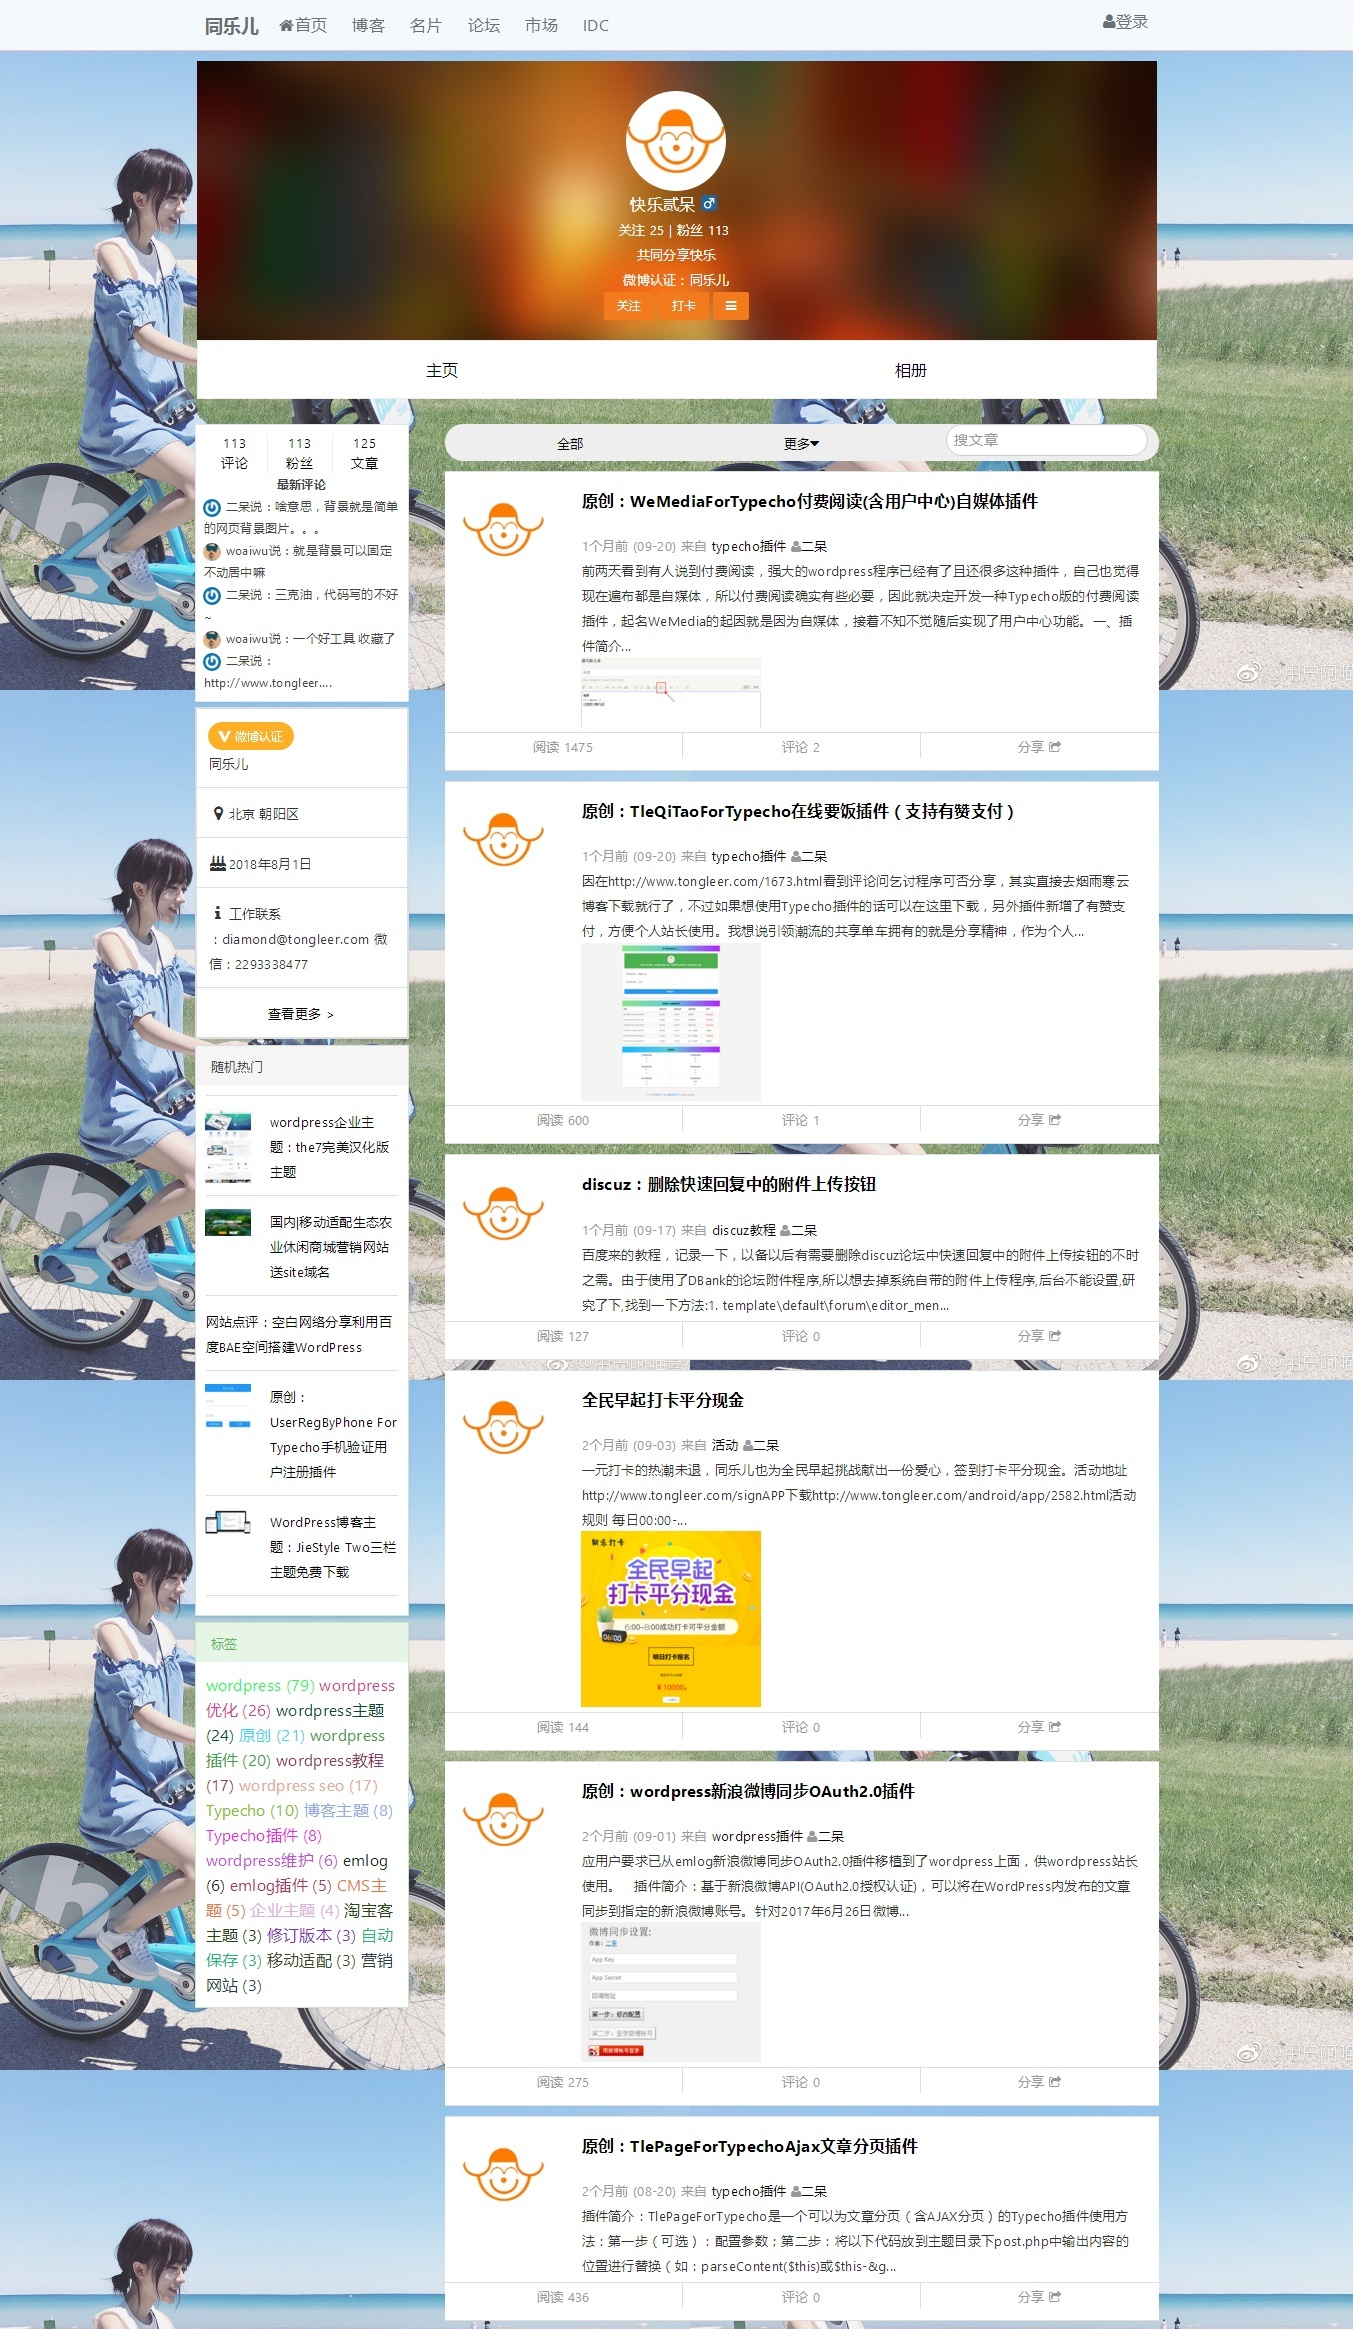 wordpress微博(Weibo)个人主题tongleer''/